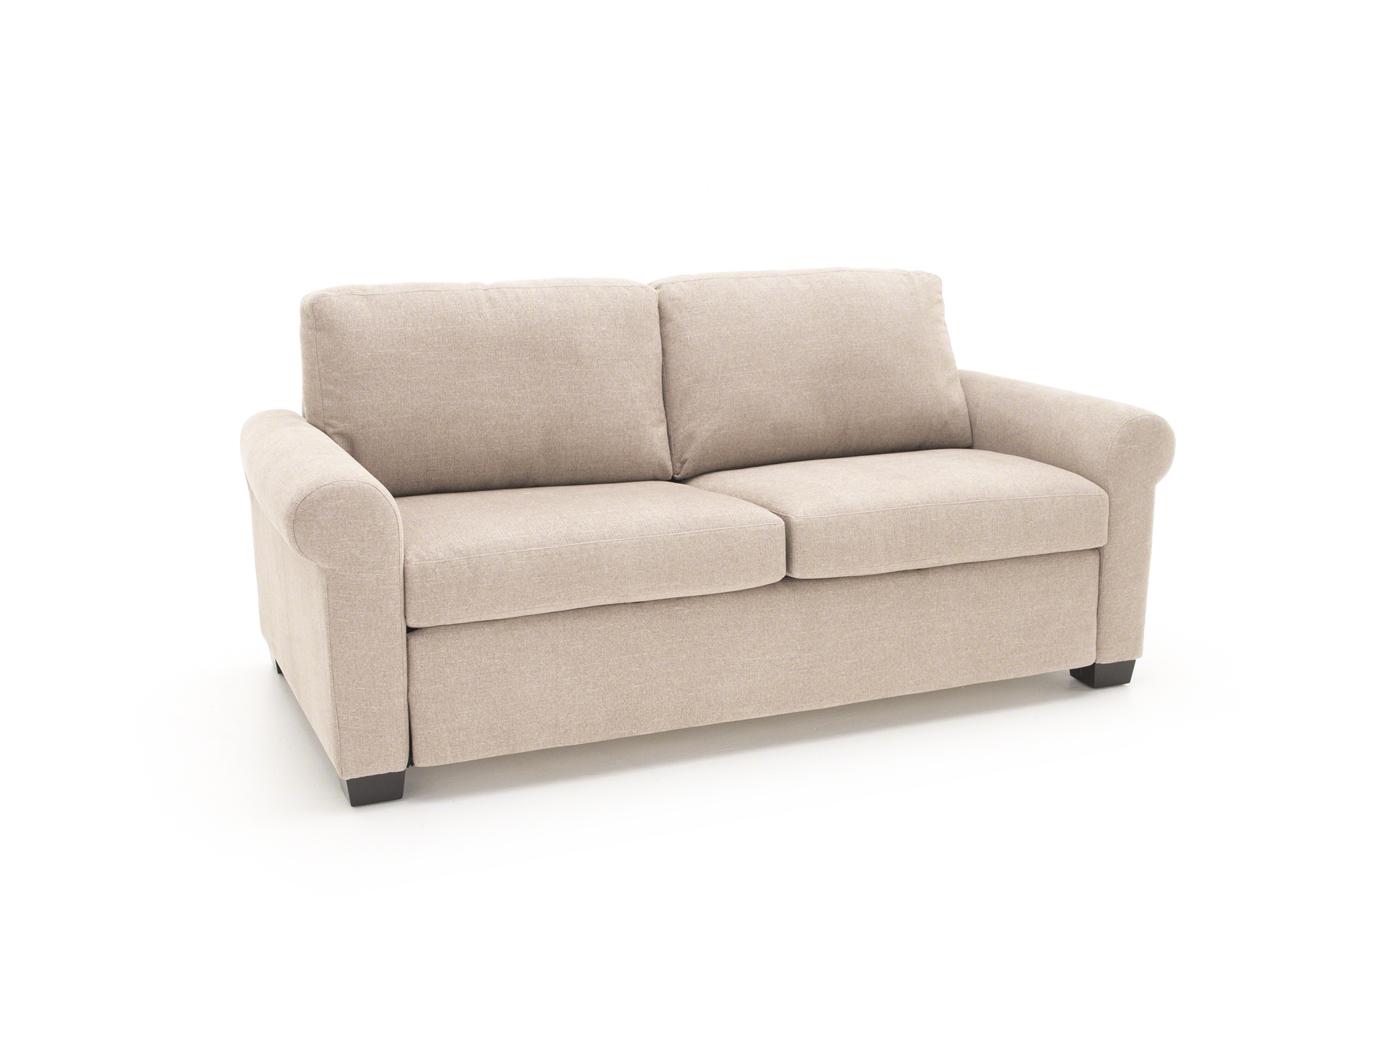 buy sleeper sofa modular sofas melbourne tips to inspiring home design